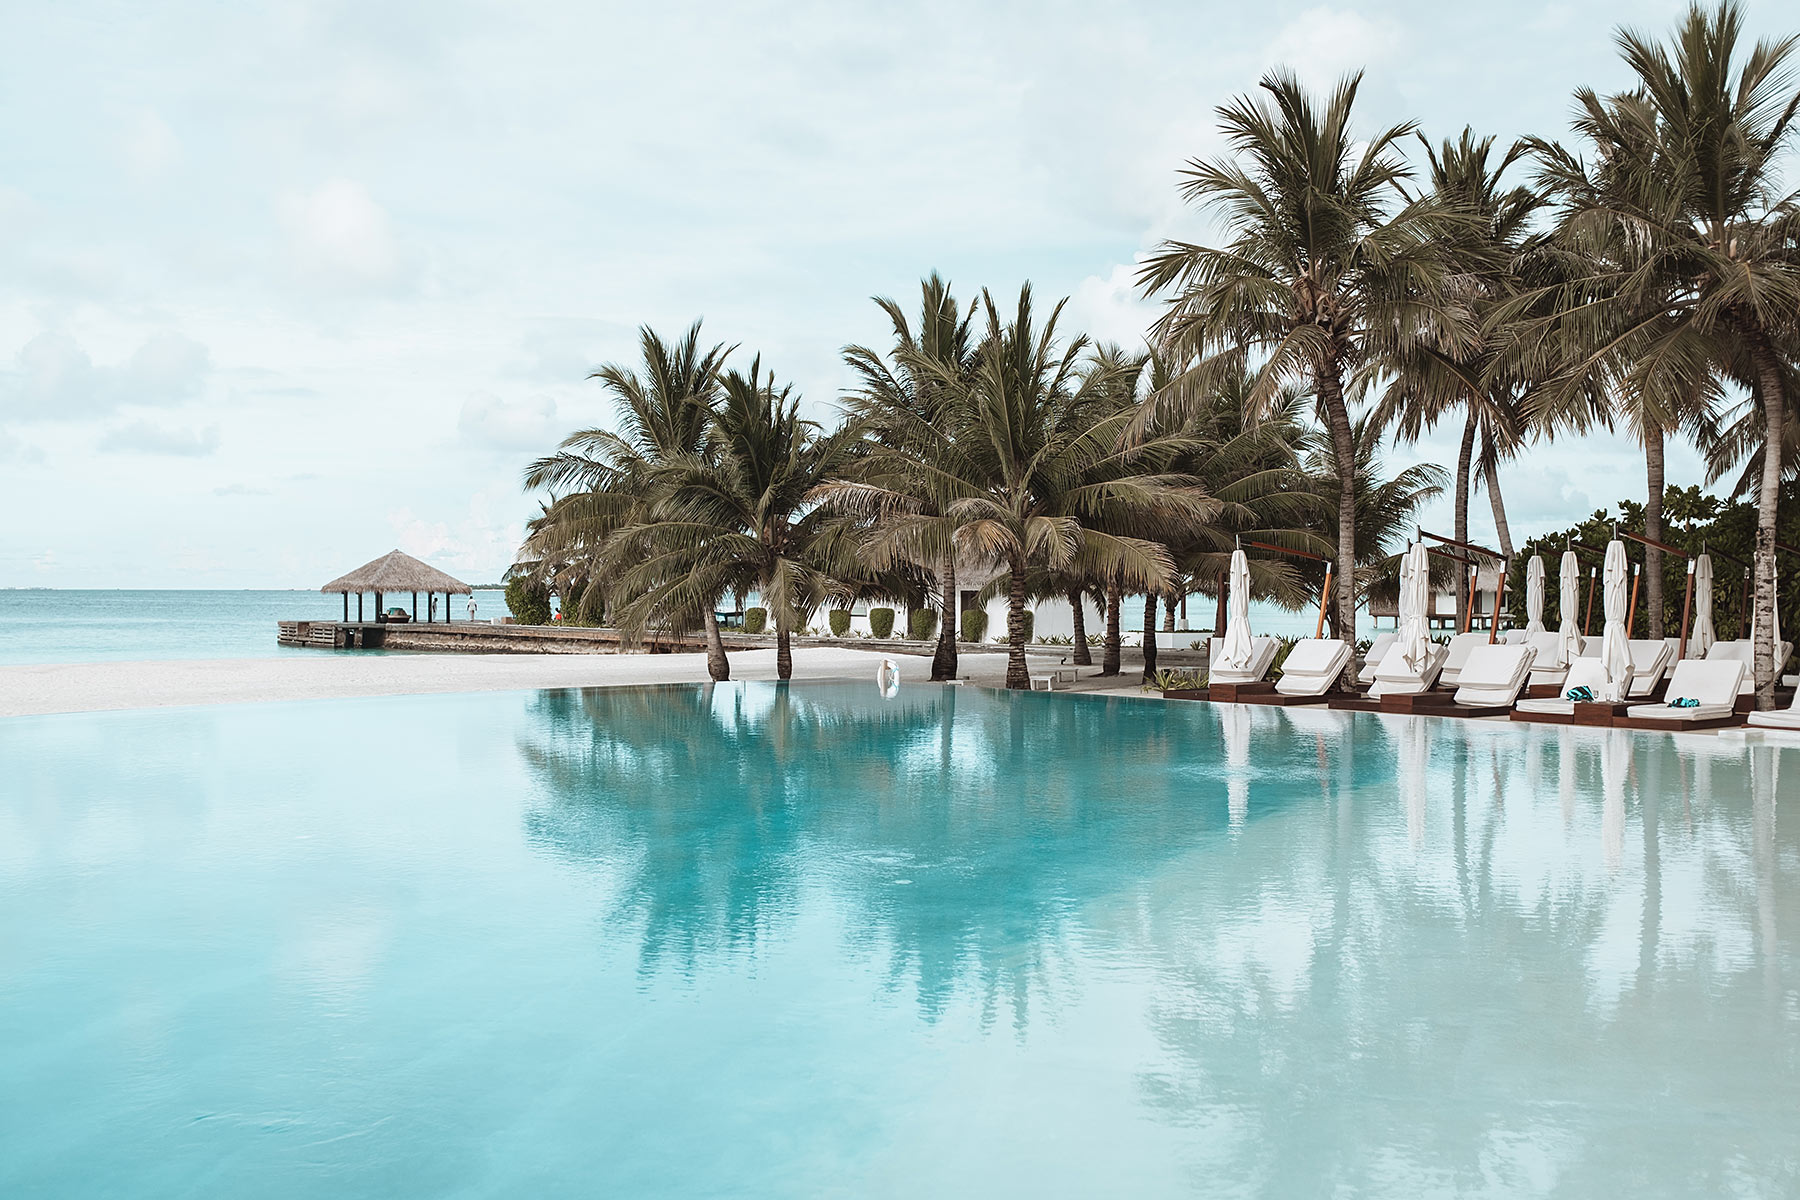 velassaru maldives infinity pool travel blog sunnyinga